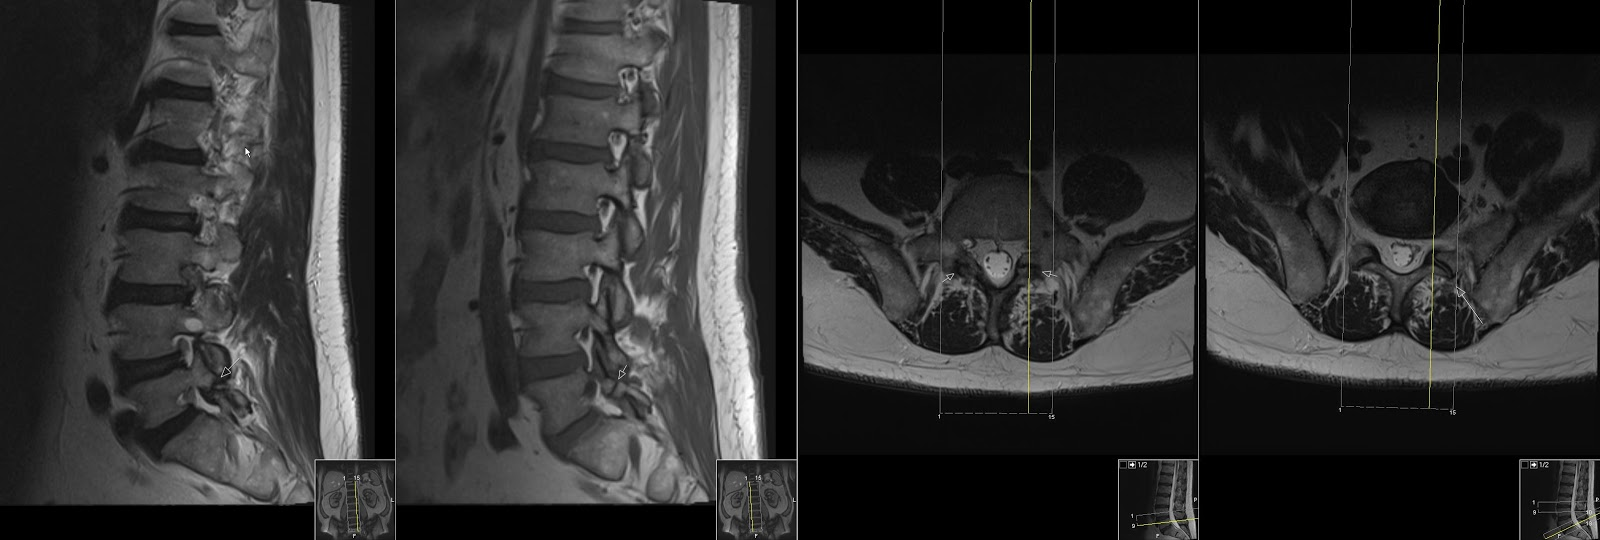 Radiology thesis on mri